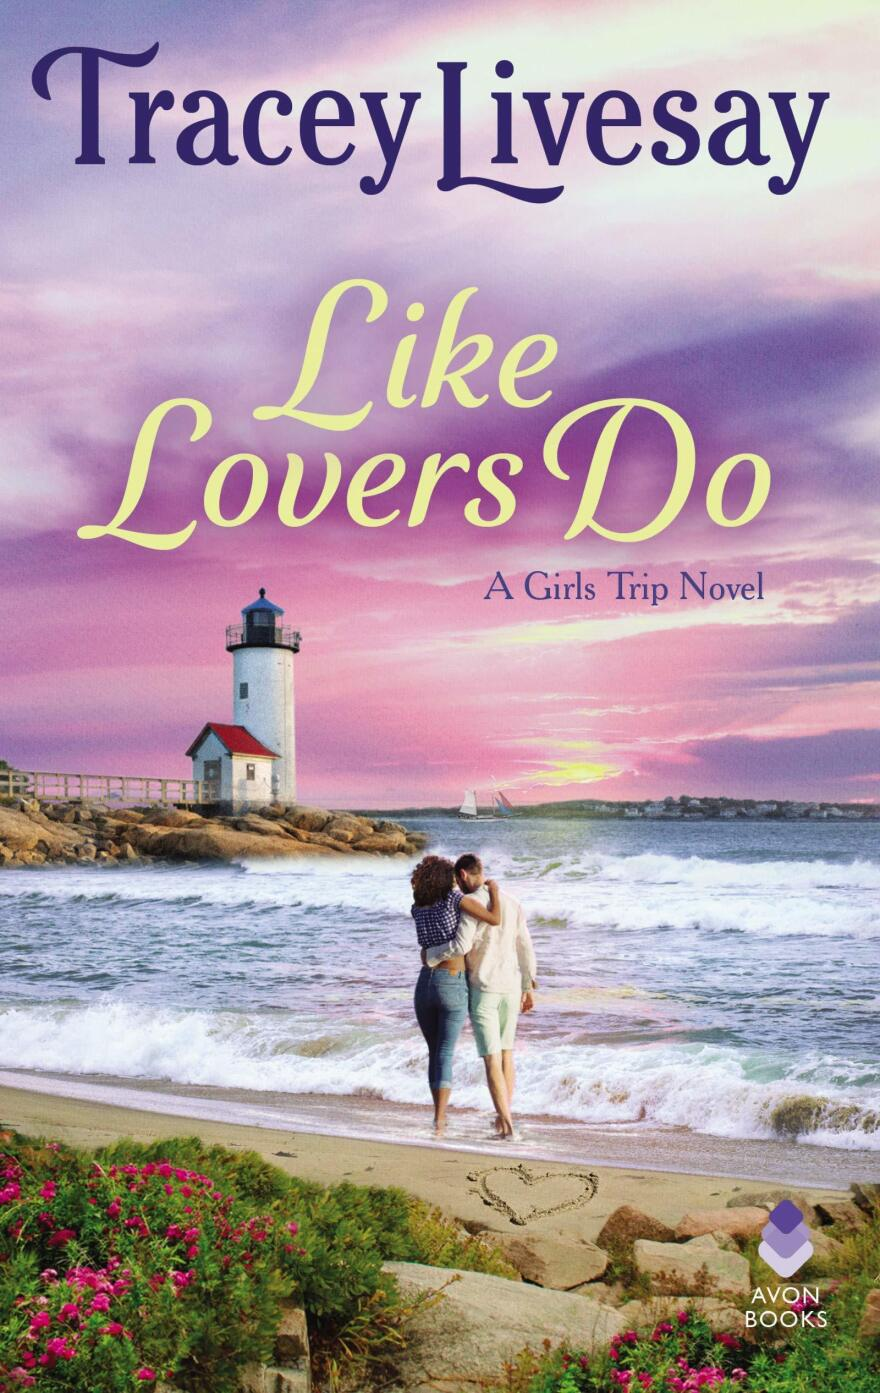 Like Lovers Do, by Tracy Livesay